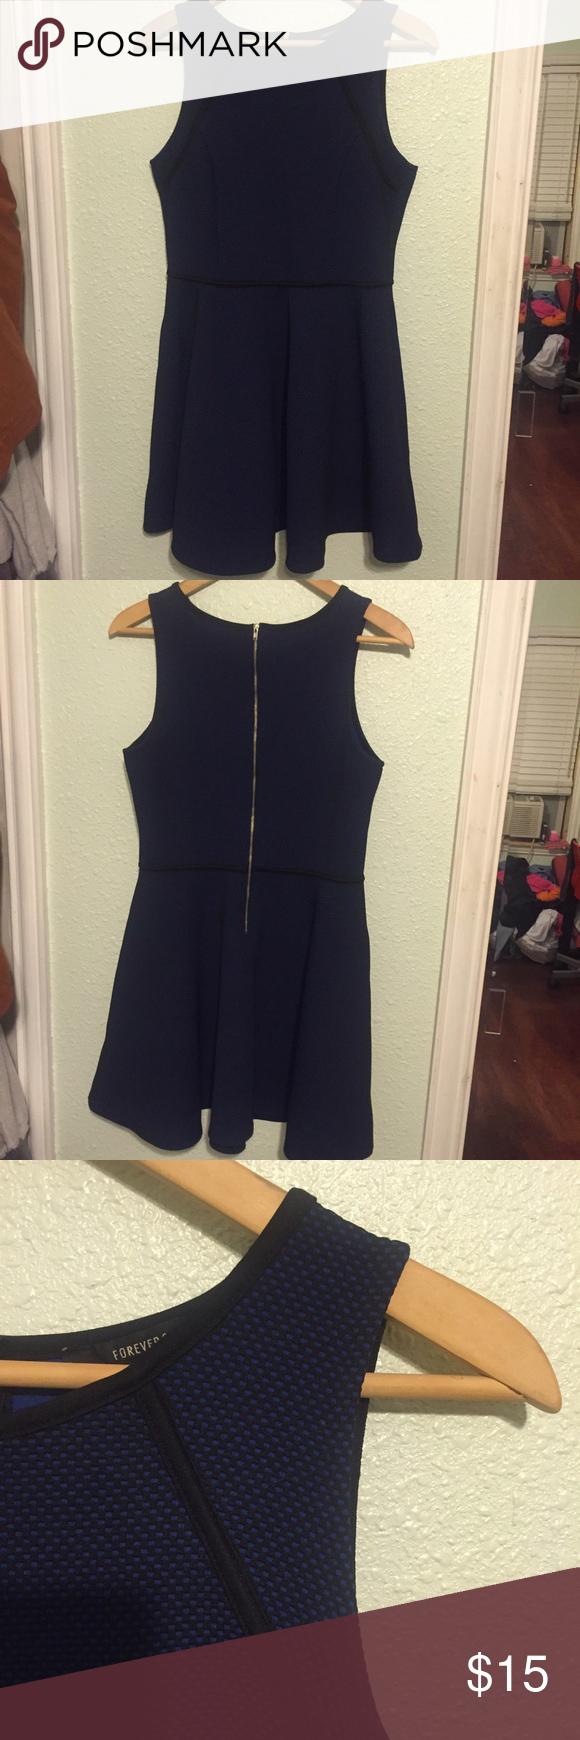 Black and blue forever dress black mesh st dresses and large